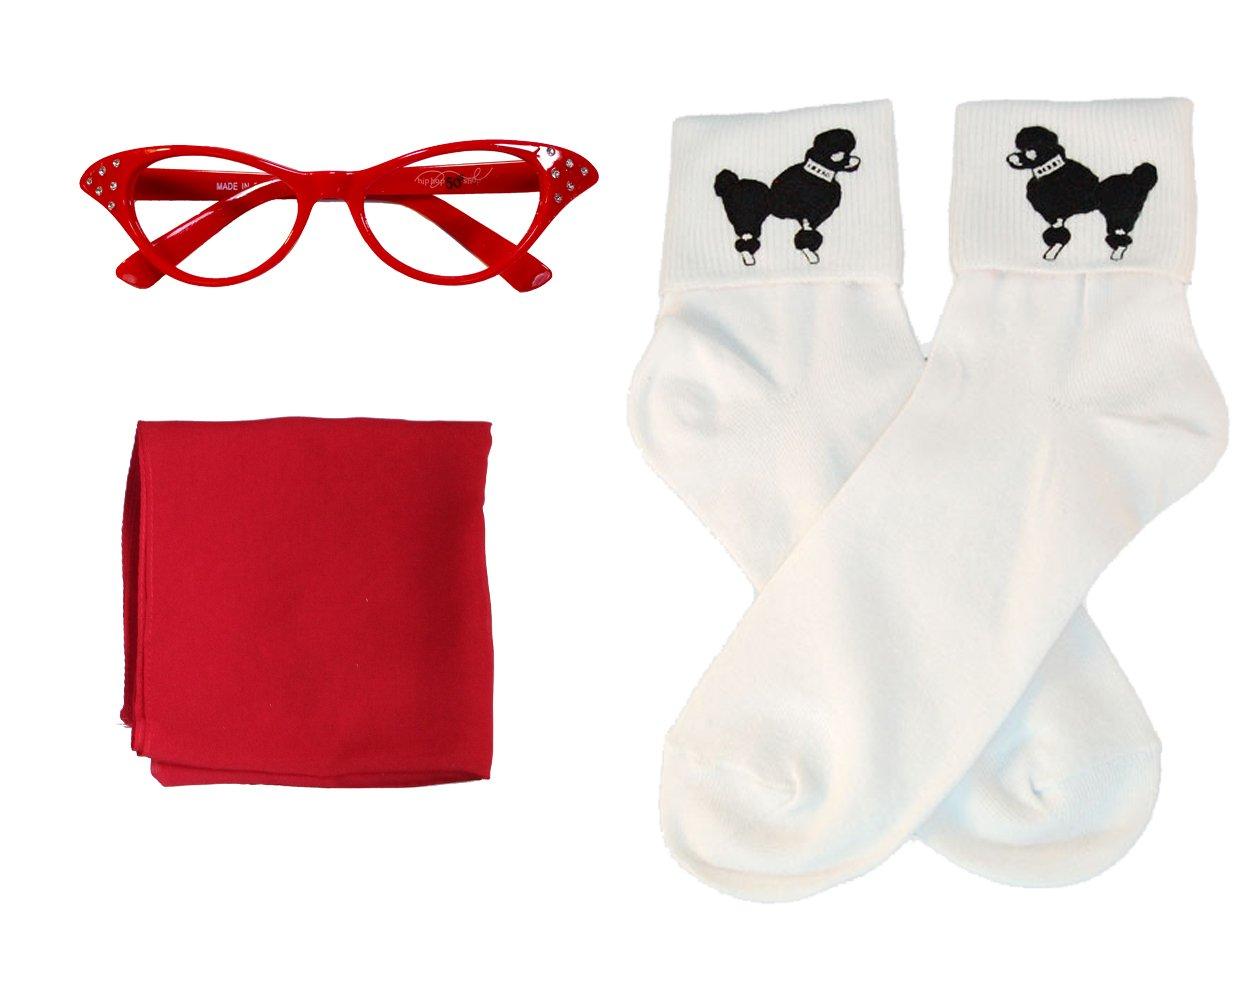 Hip Hop 50s Shop Adult 7 Piece Poodle Skirt Costume Set Black and Red Large by Hip Hop 50s Shop